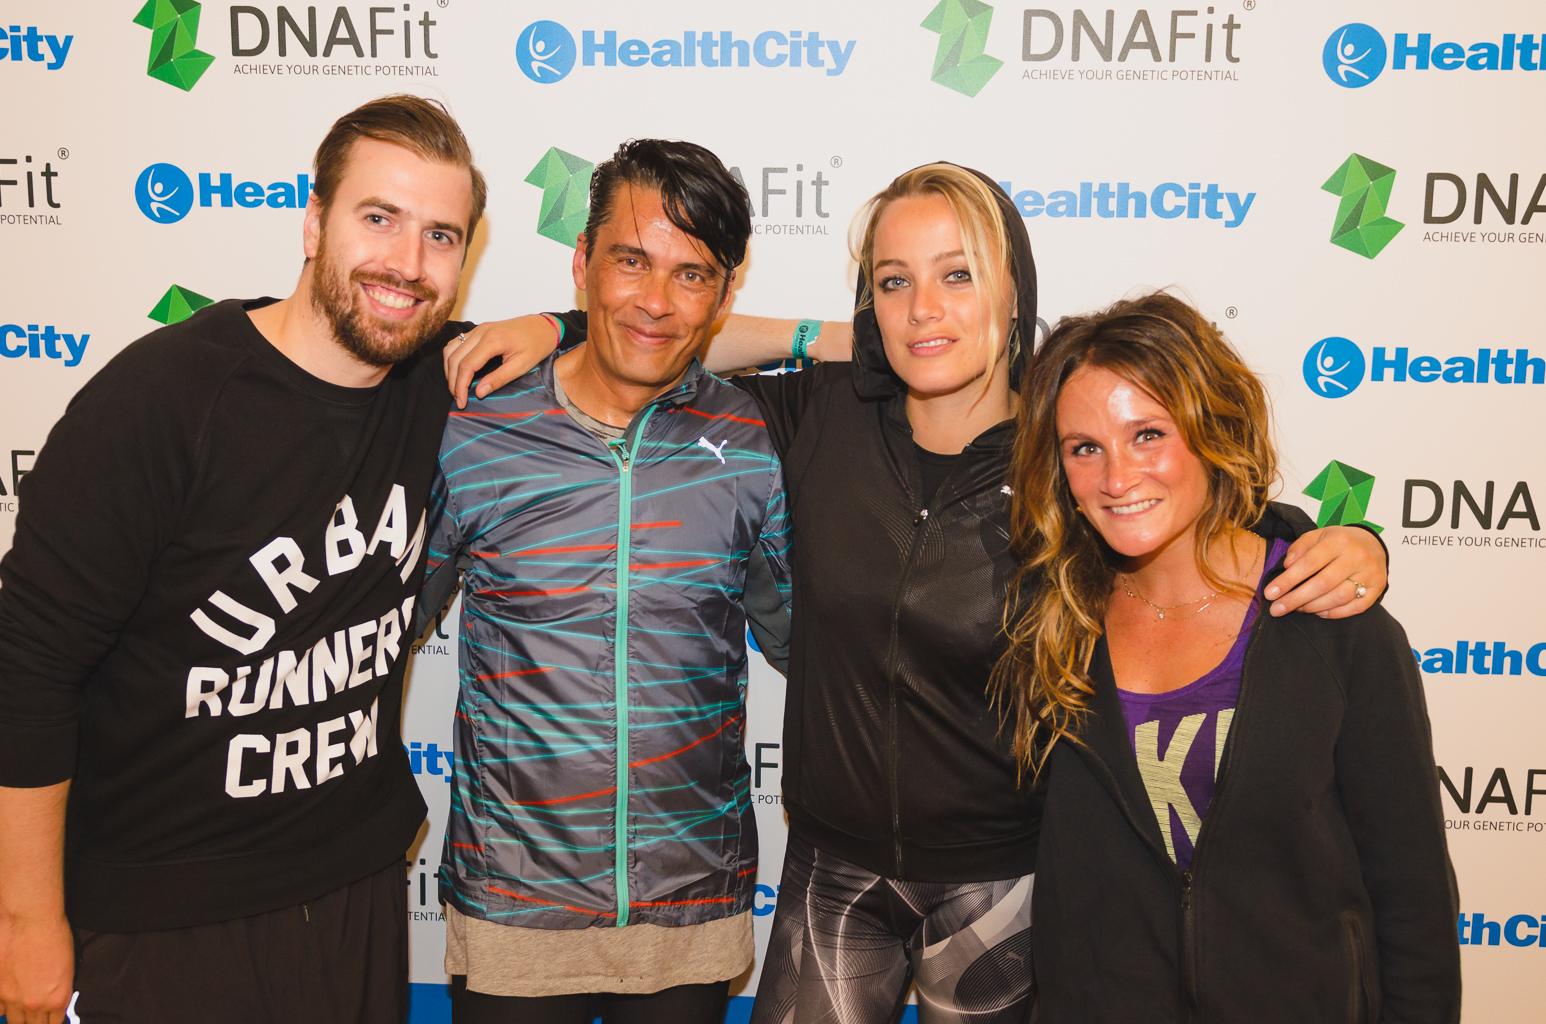 20140917 Healthcity DNAFit-042